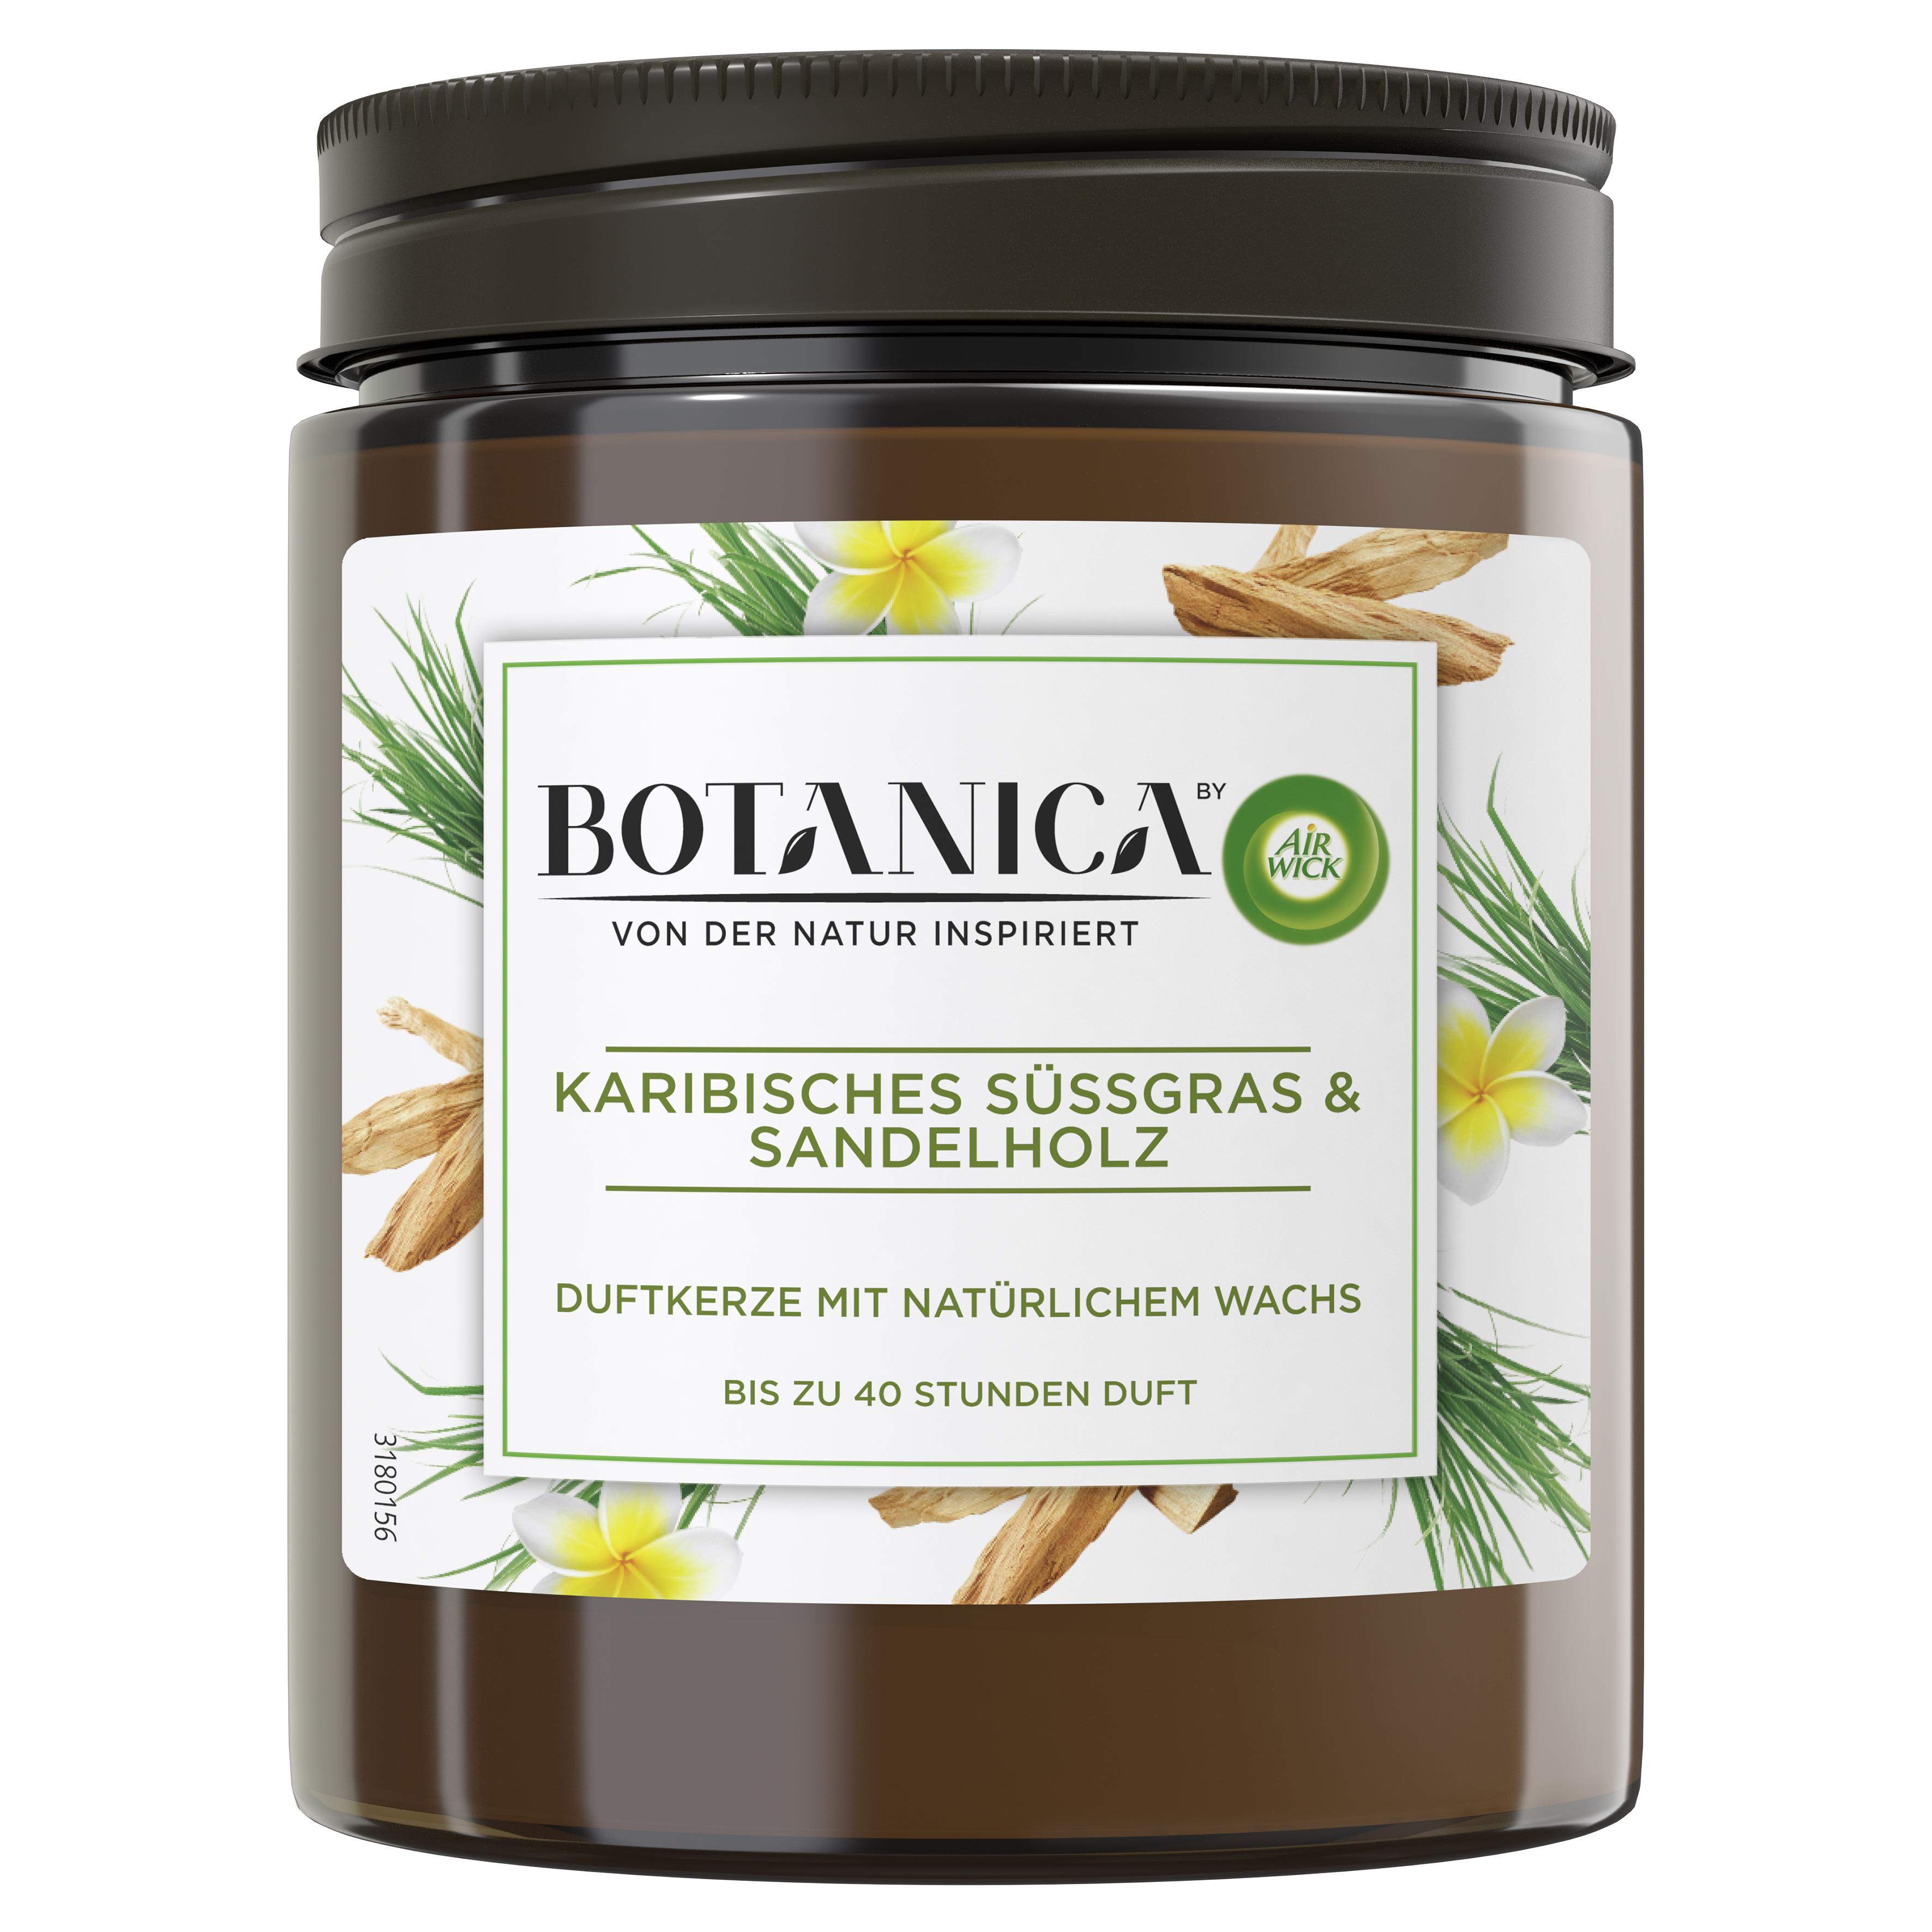 Air Wick Botanica Duftkerze Karibisches Süßgras & Sandelholz